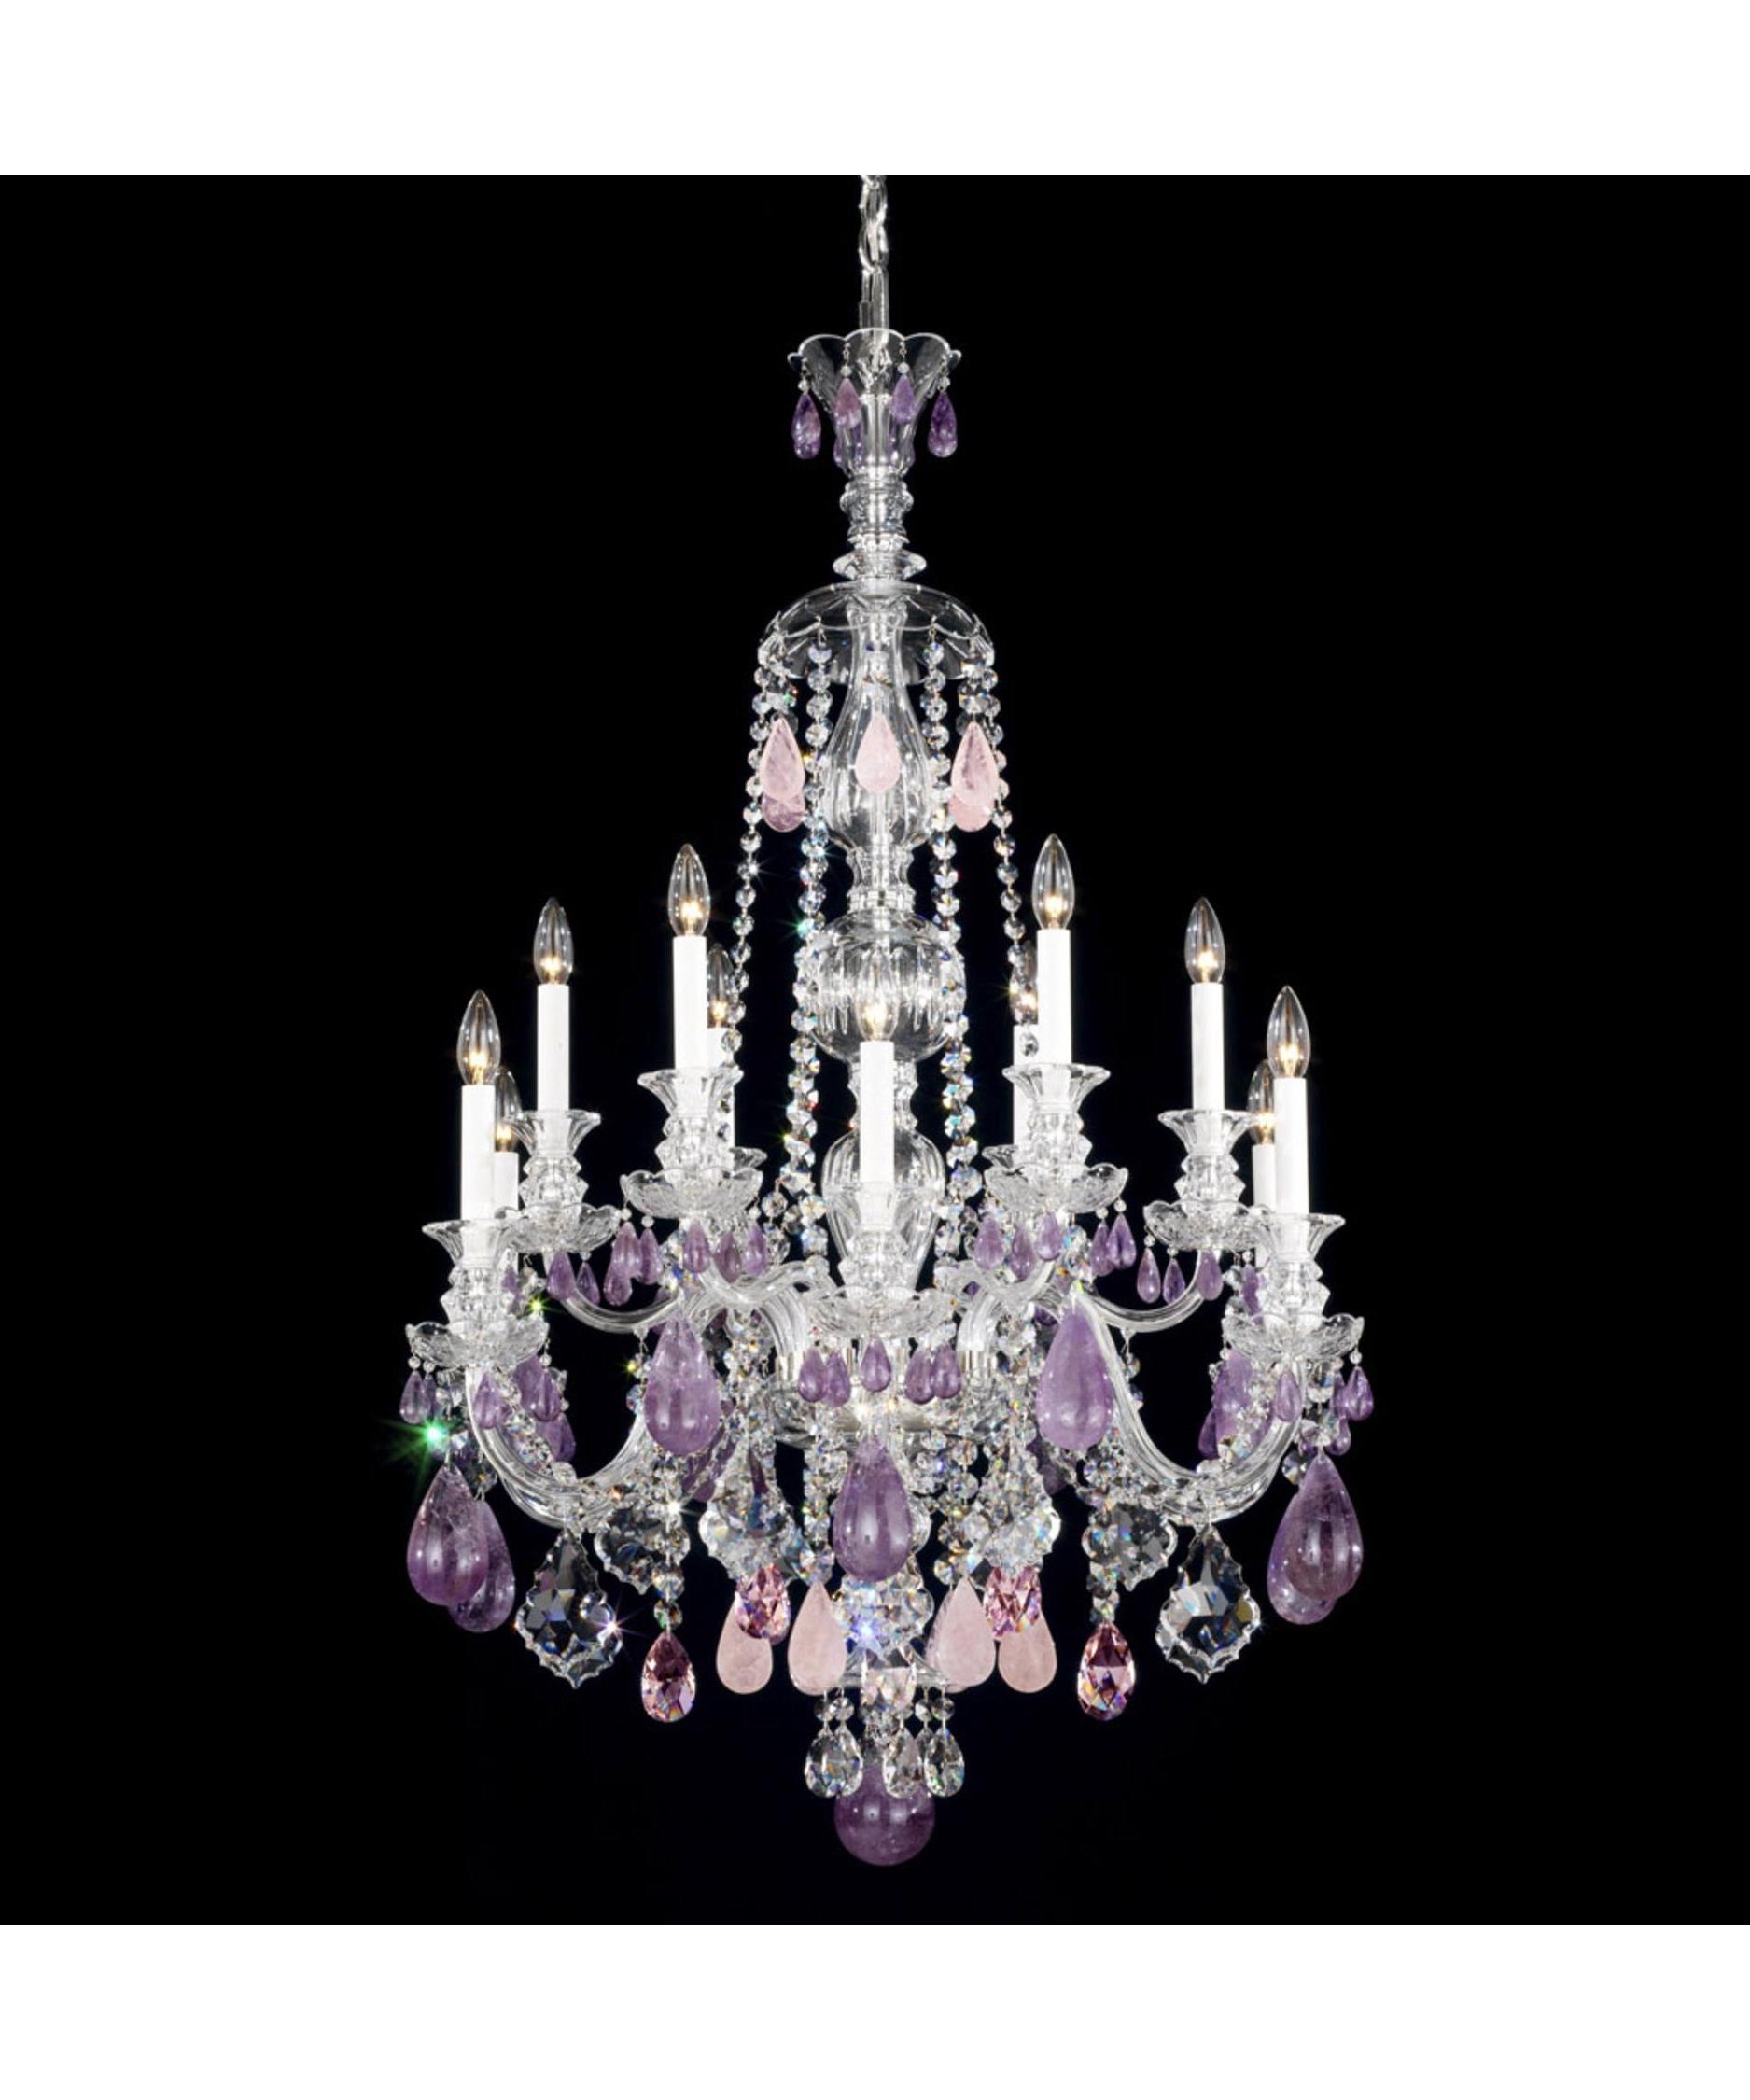 Schonbek 5508 Hamilton Rock Crystal 30 Inch Wide 12 Light Chandelier For Latest Purple Crystal Chandelier Lighting (View 3 of 15)